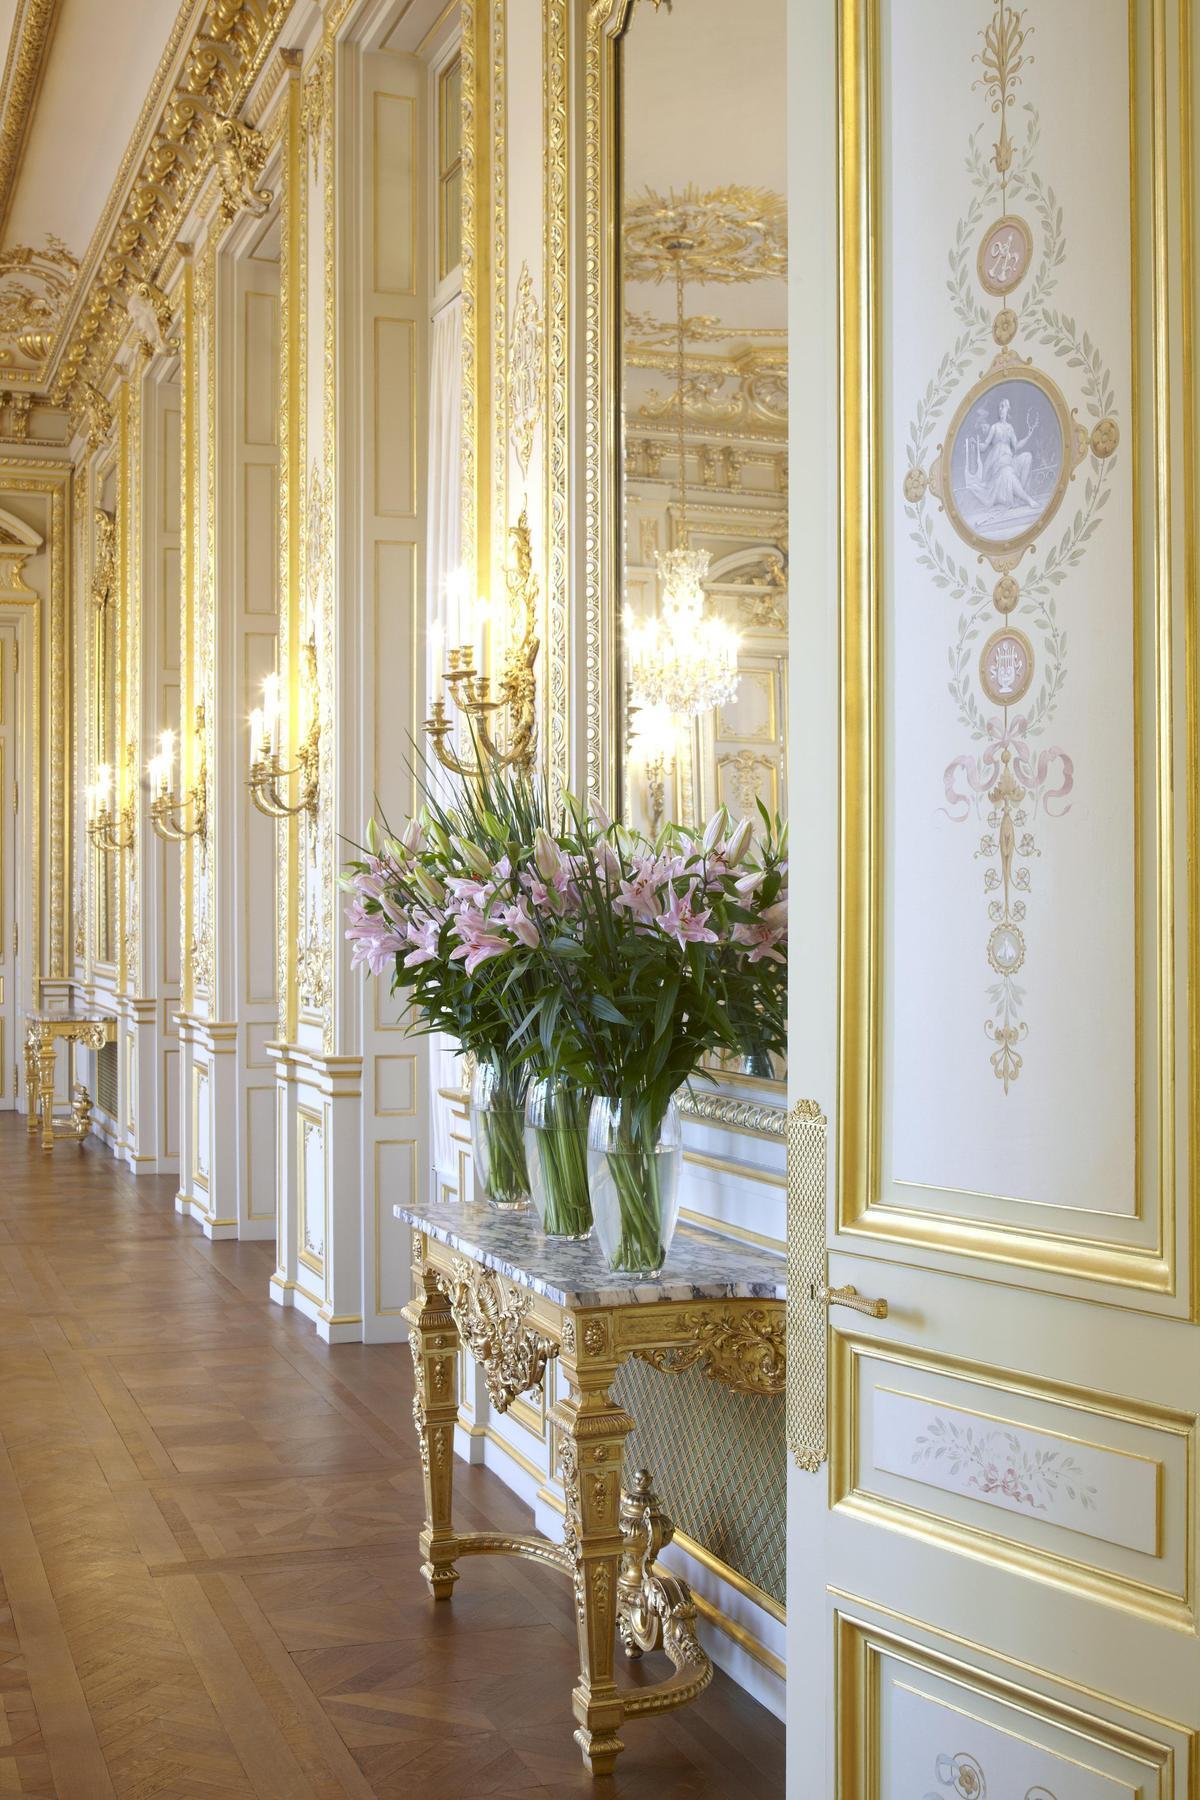 Grand Slaon的許多裝飾細節都放上拿破崙家族的蜜蜂家徽。(巴黎香格里拉提供)